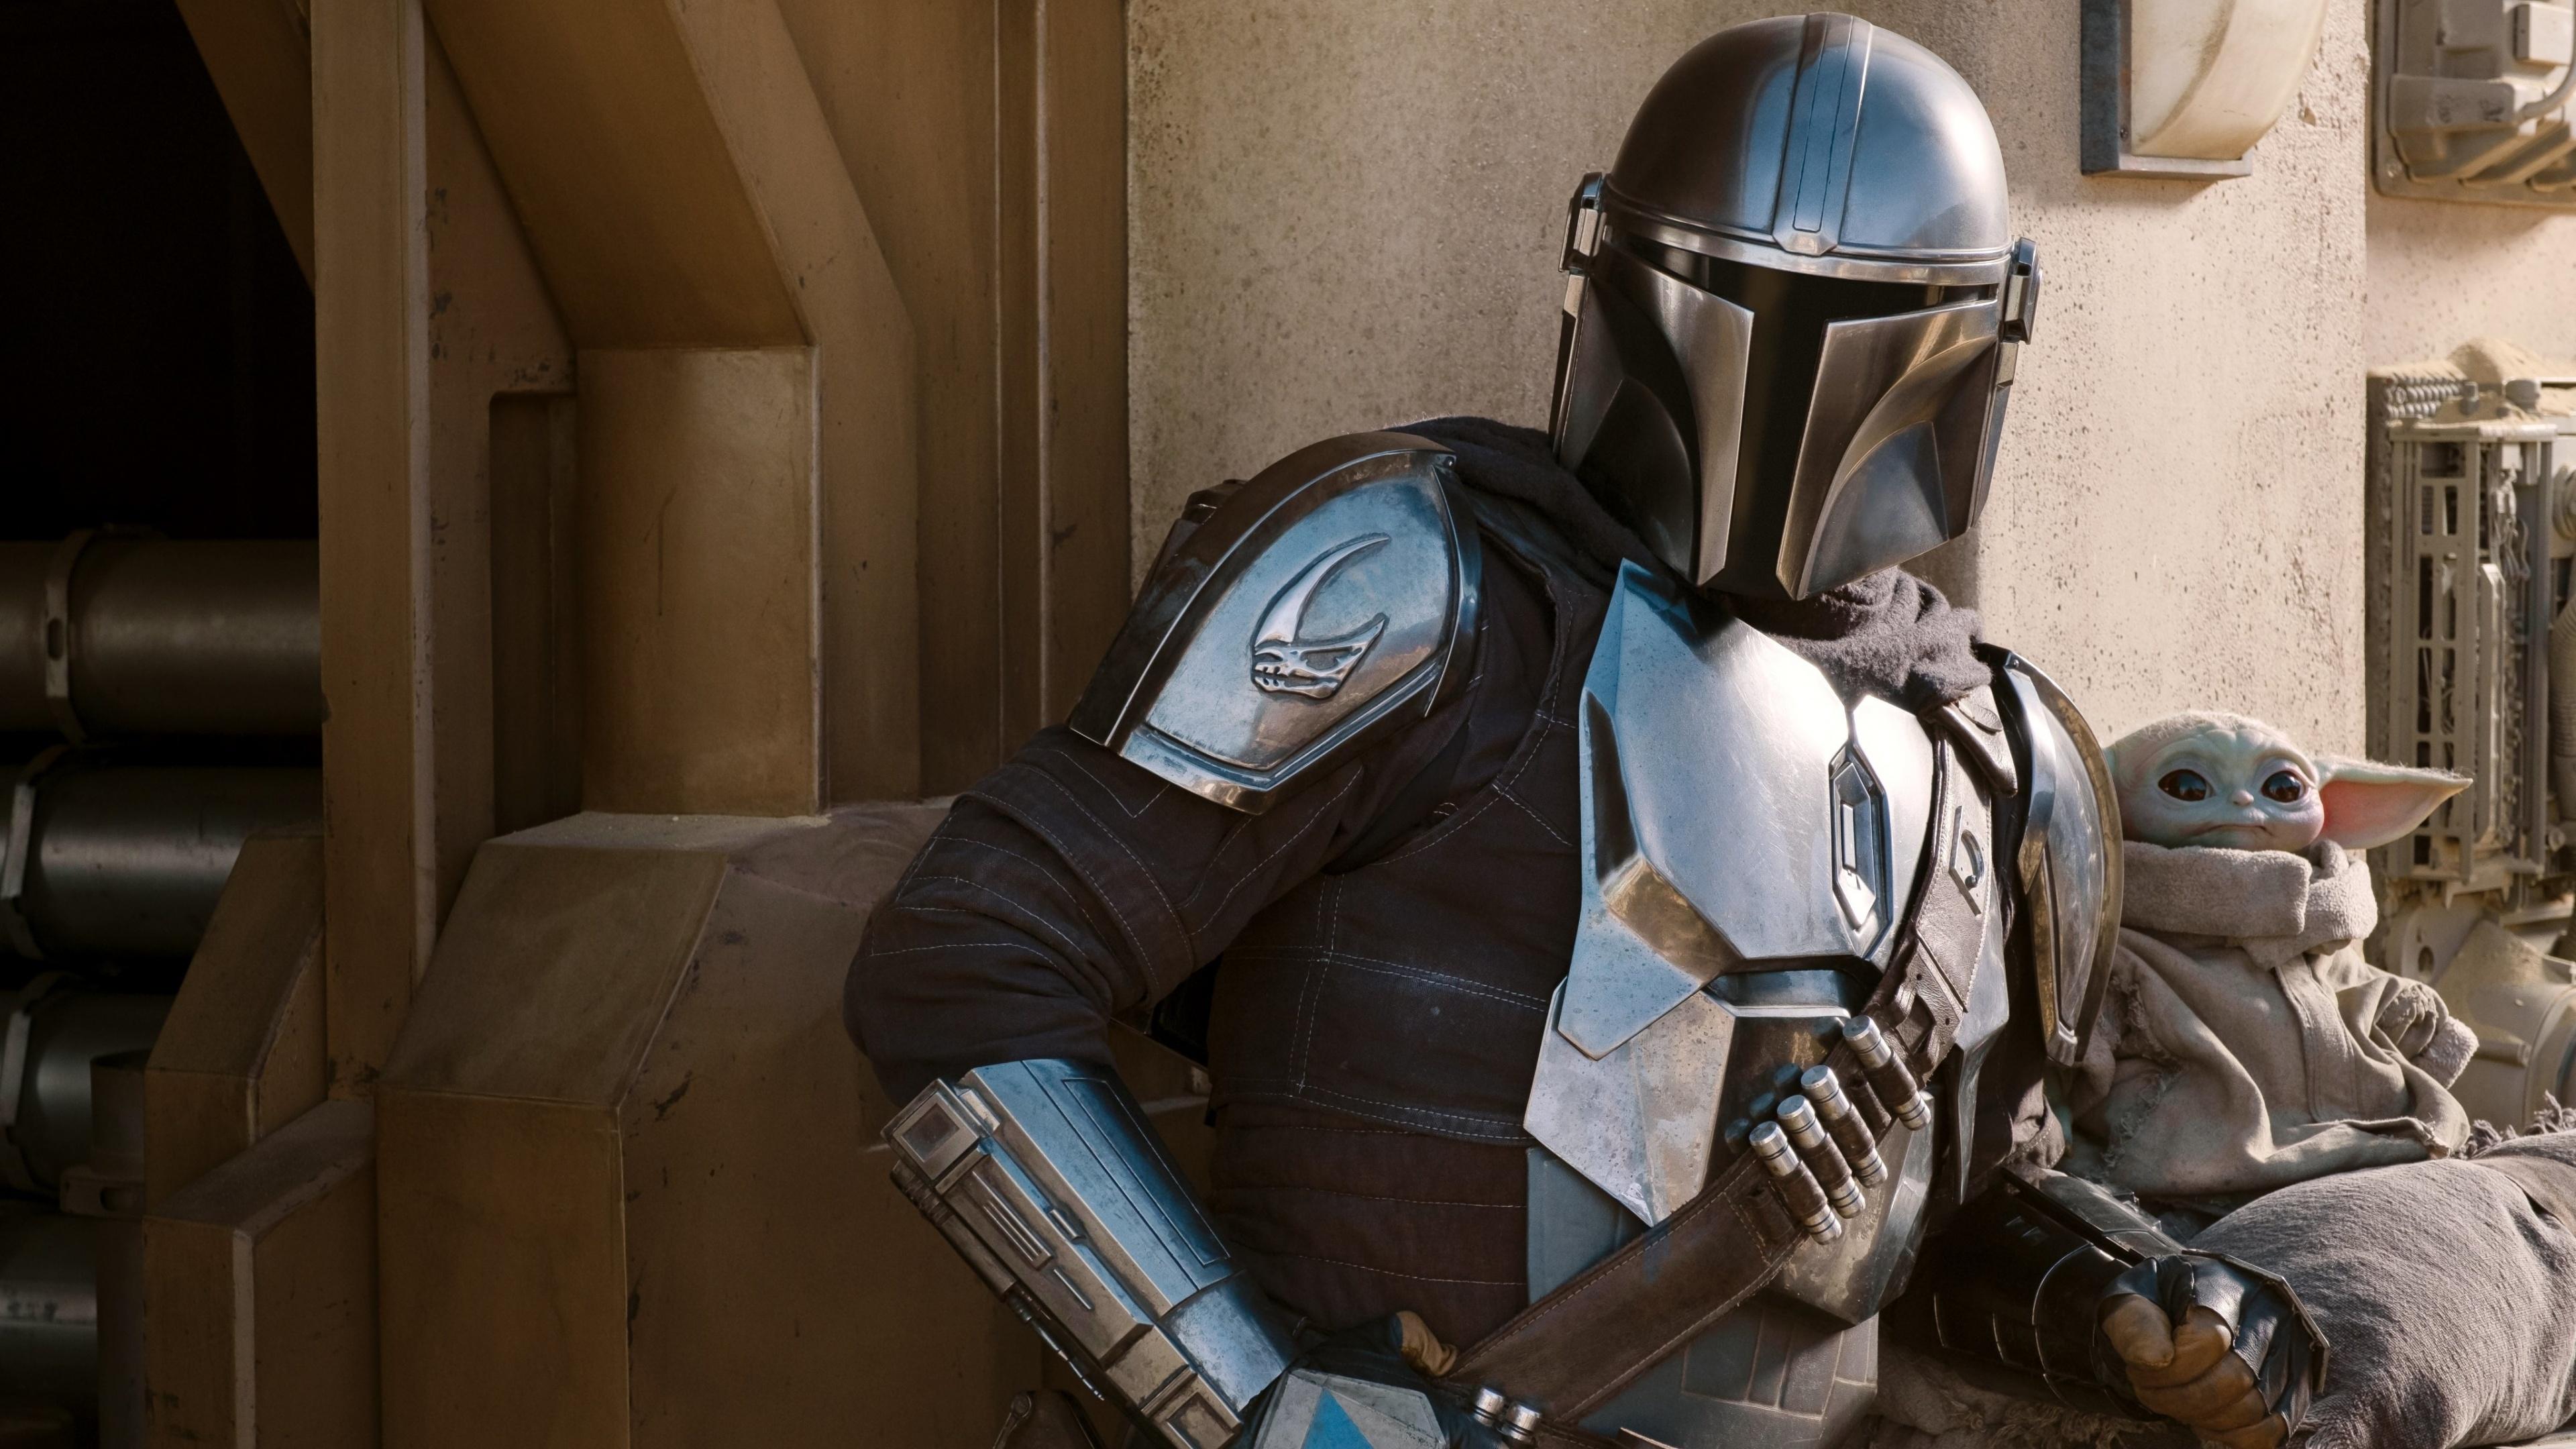 The Mandalorian 4k Wallpaper Silver Armor Season 2 2020 Tv Series Movies 2645